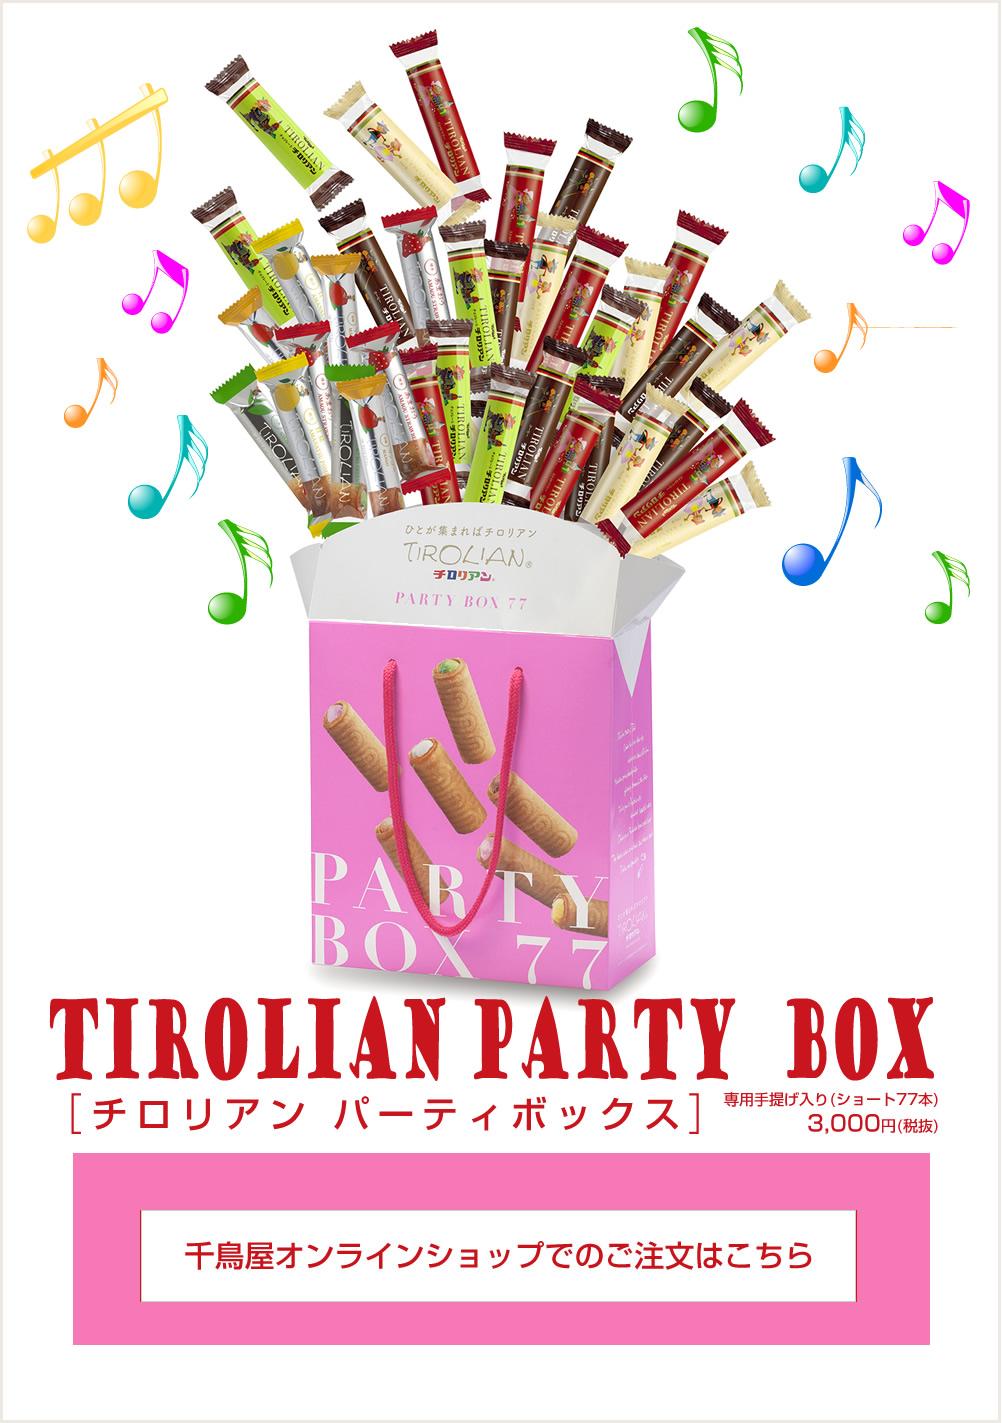 https://www.chidoriya.co.jp/img/premium/partybox.jpg